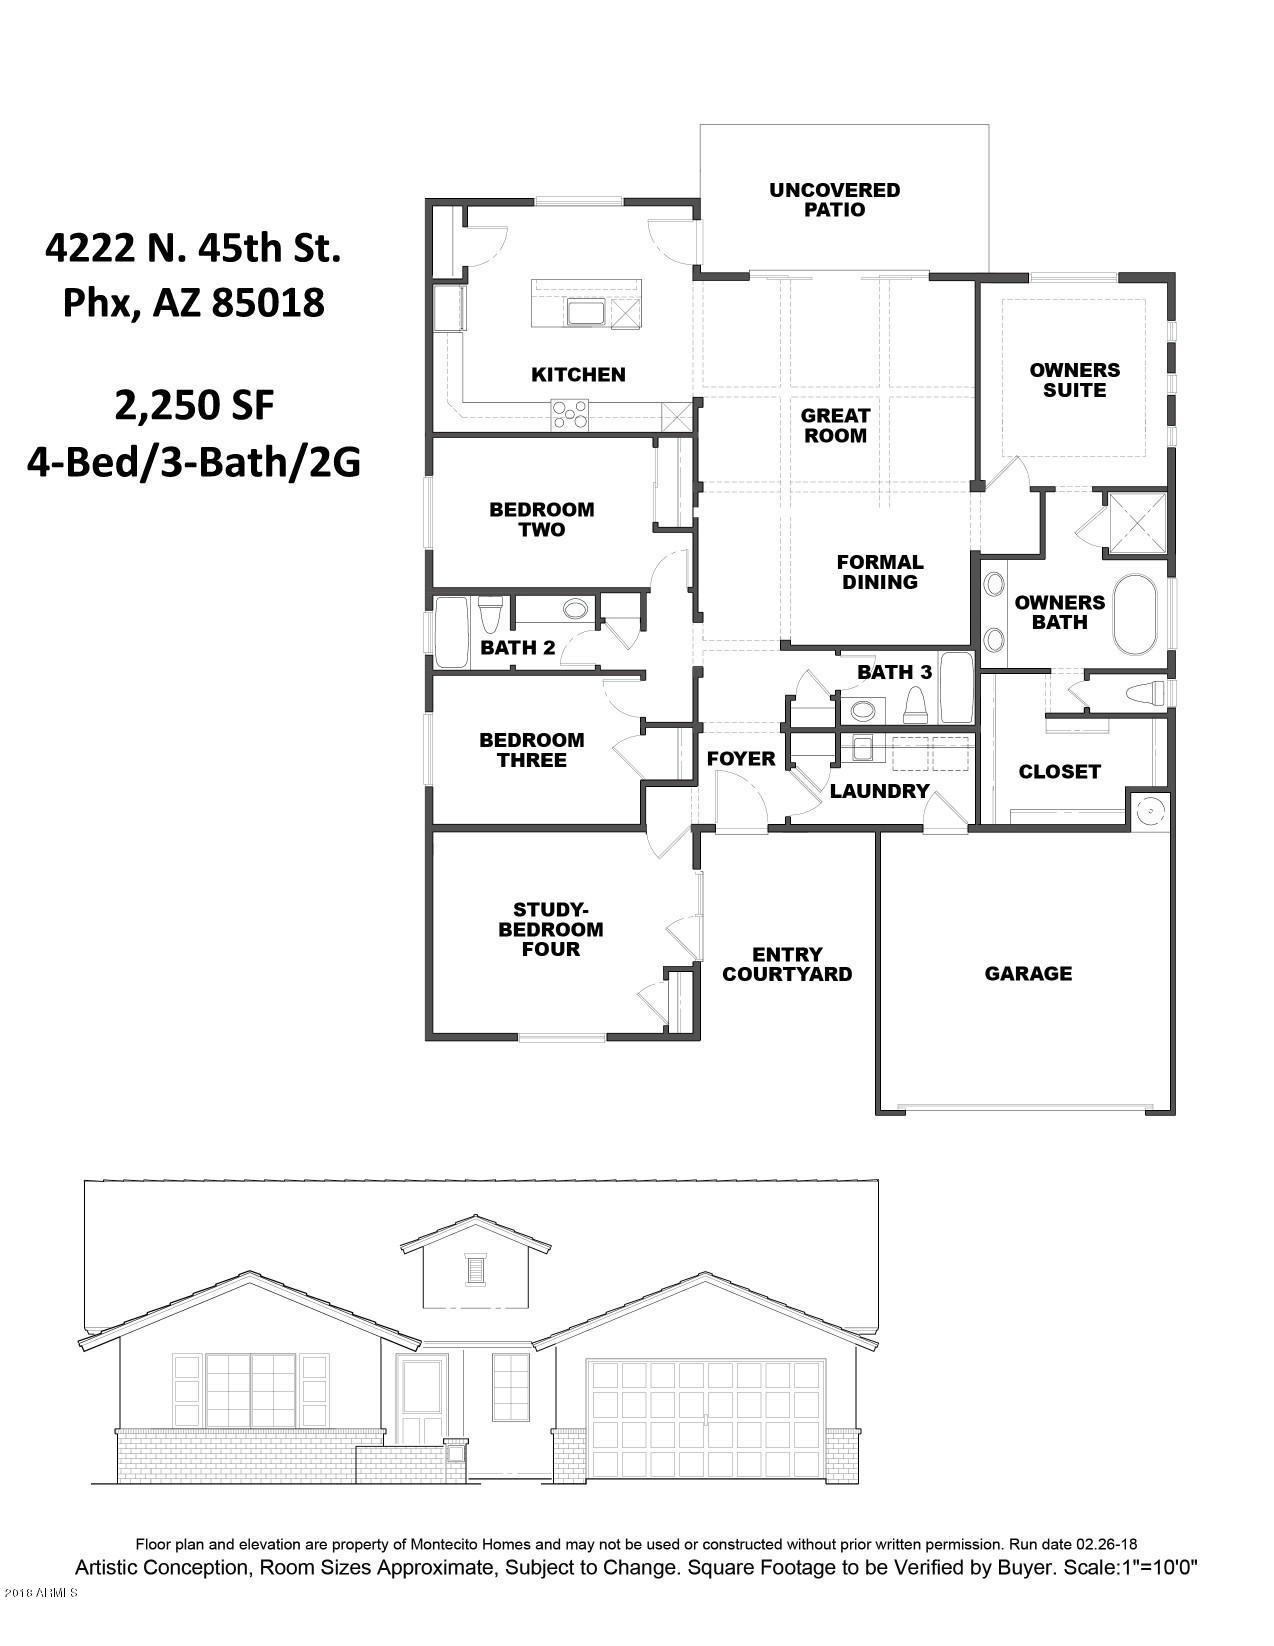 4222 N 45TH Street, Phoenix, AZ 85018 - Peggy Young, REALTOR®